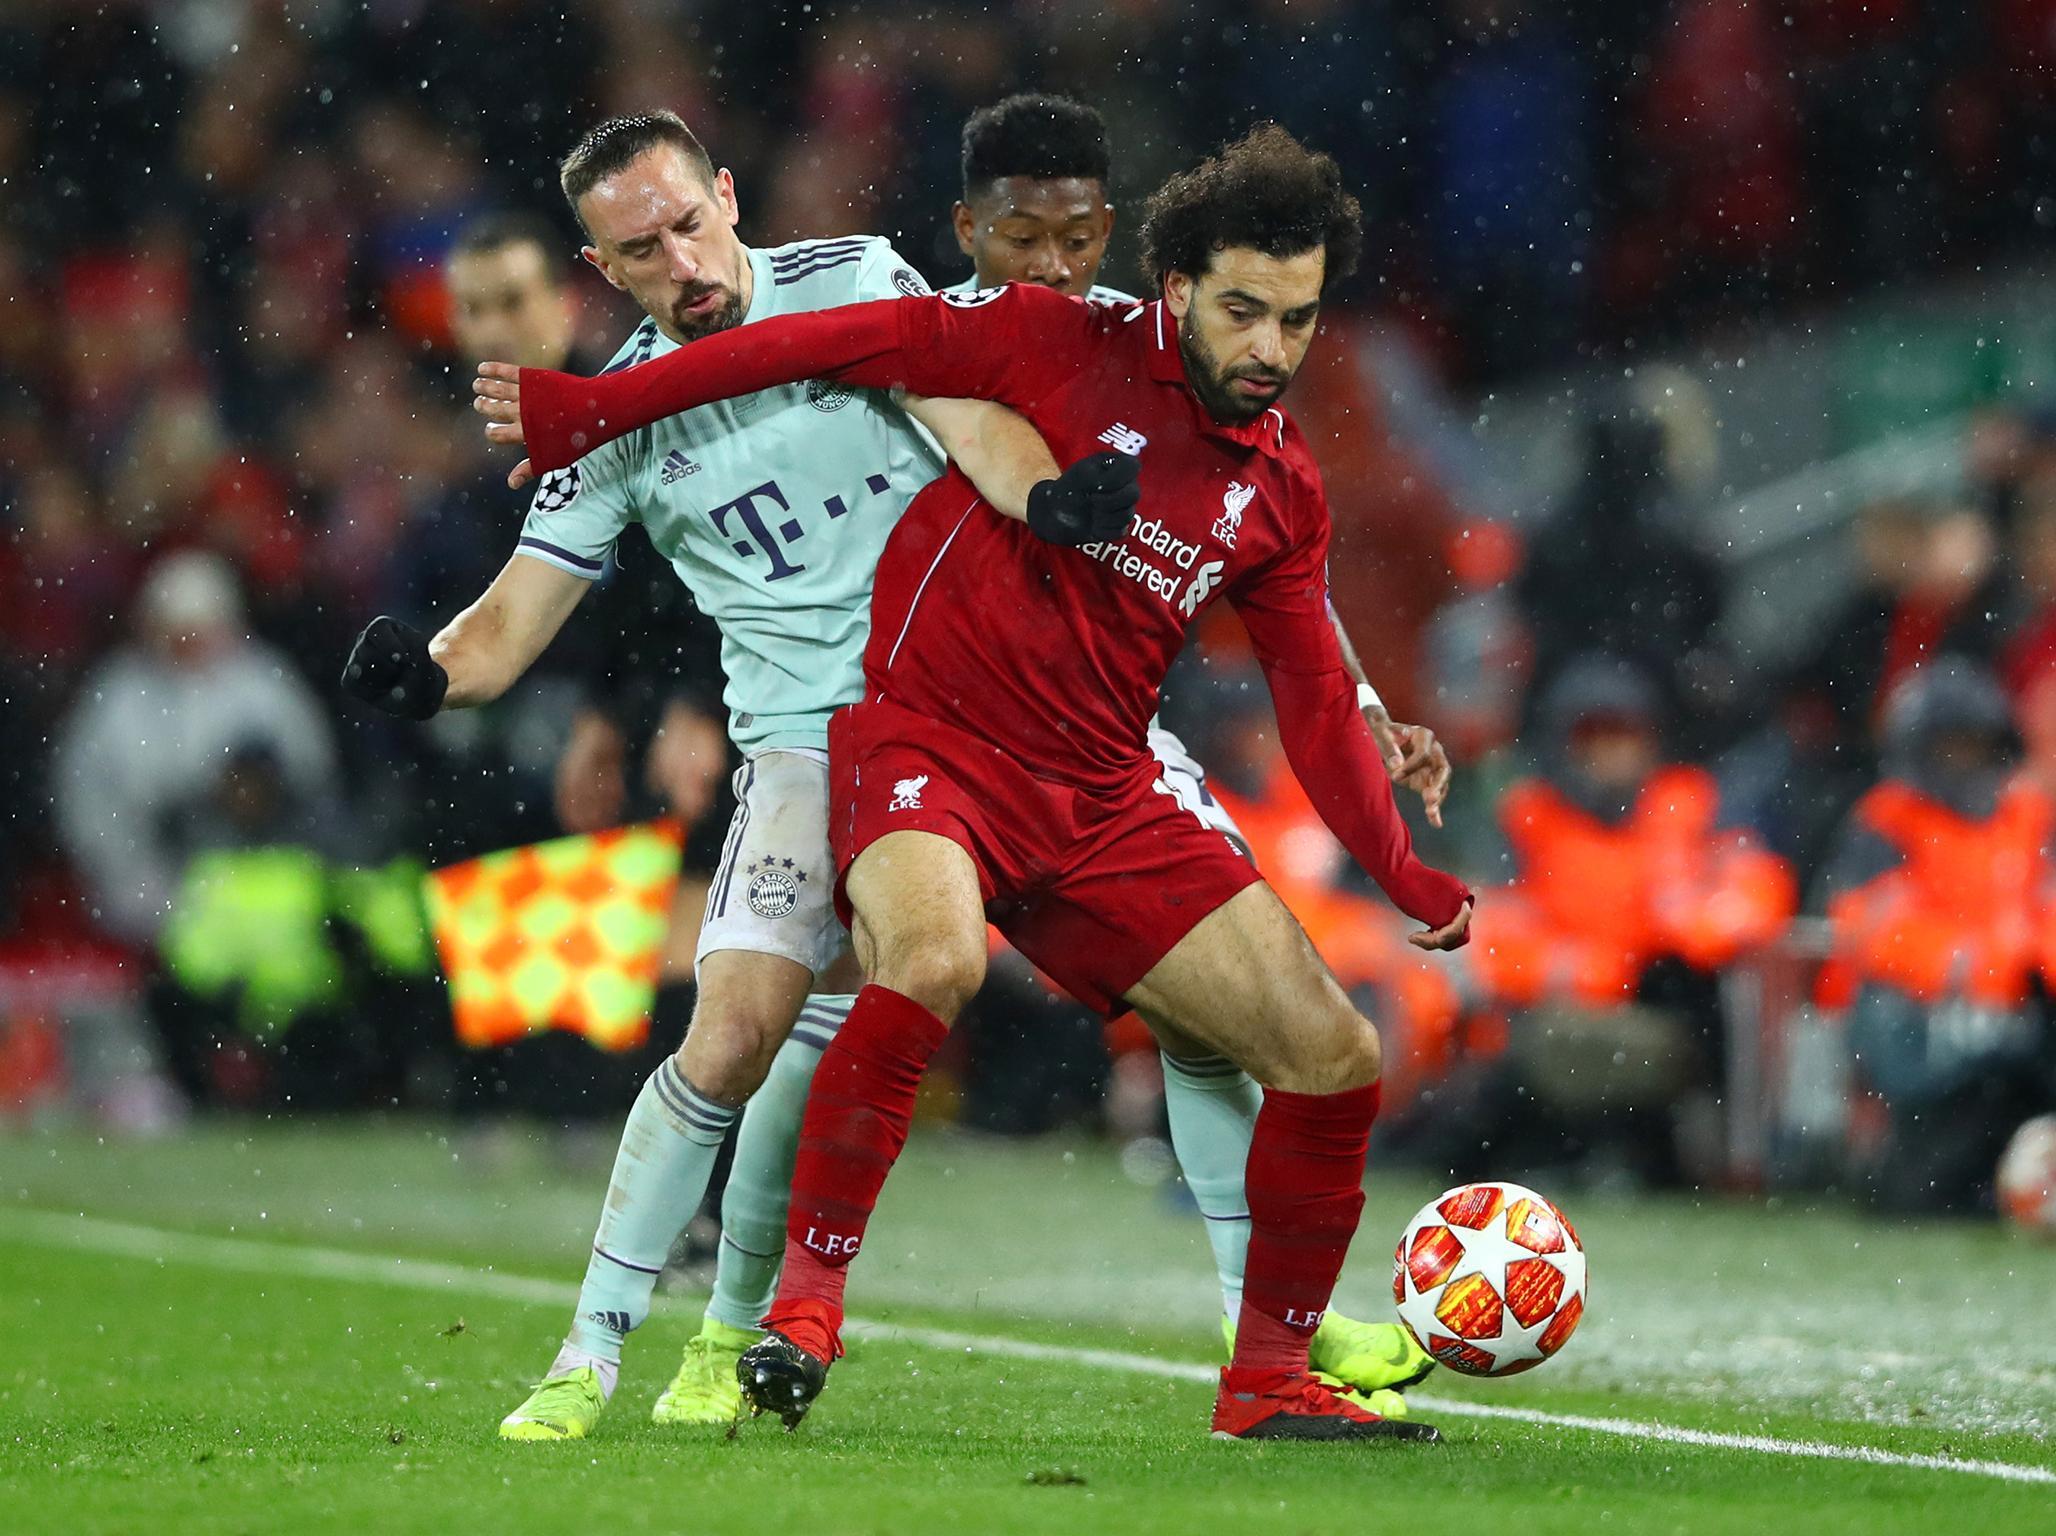 Liverpool v Tottenham live stream: Free BT Sport YouTube